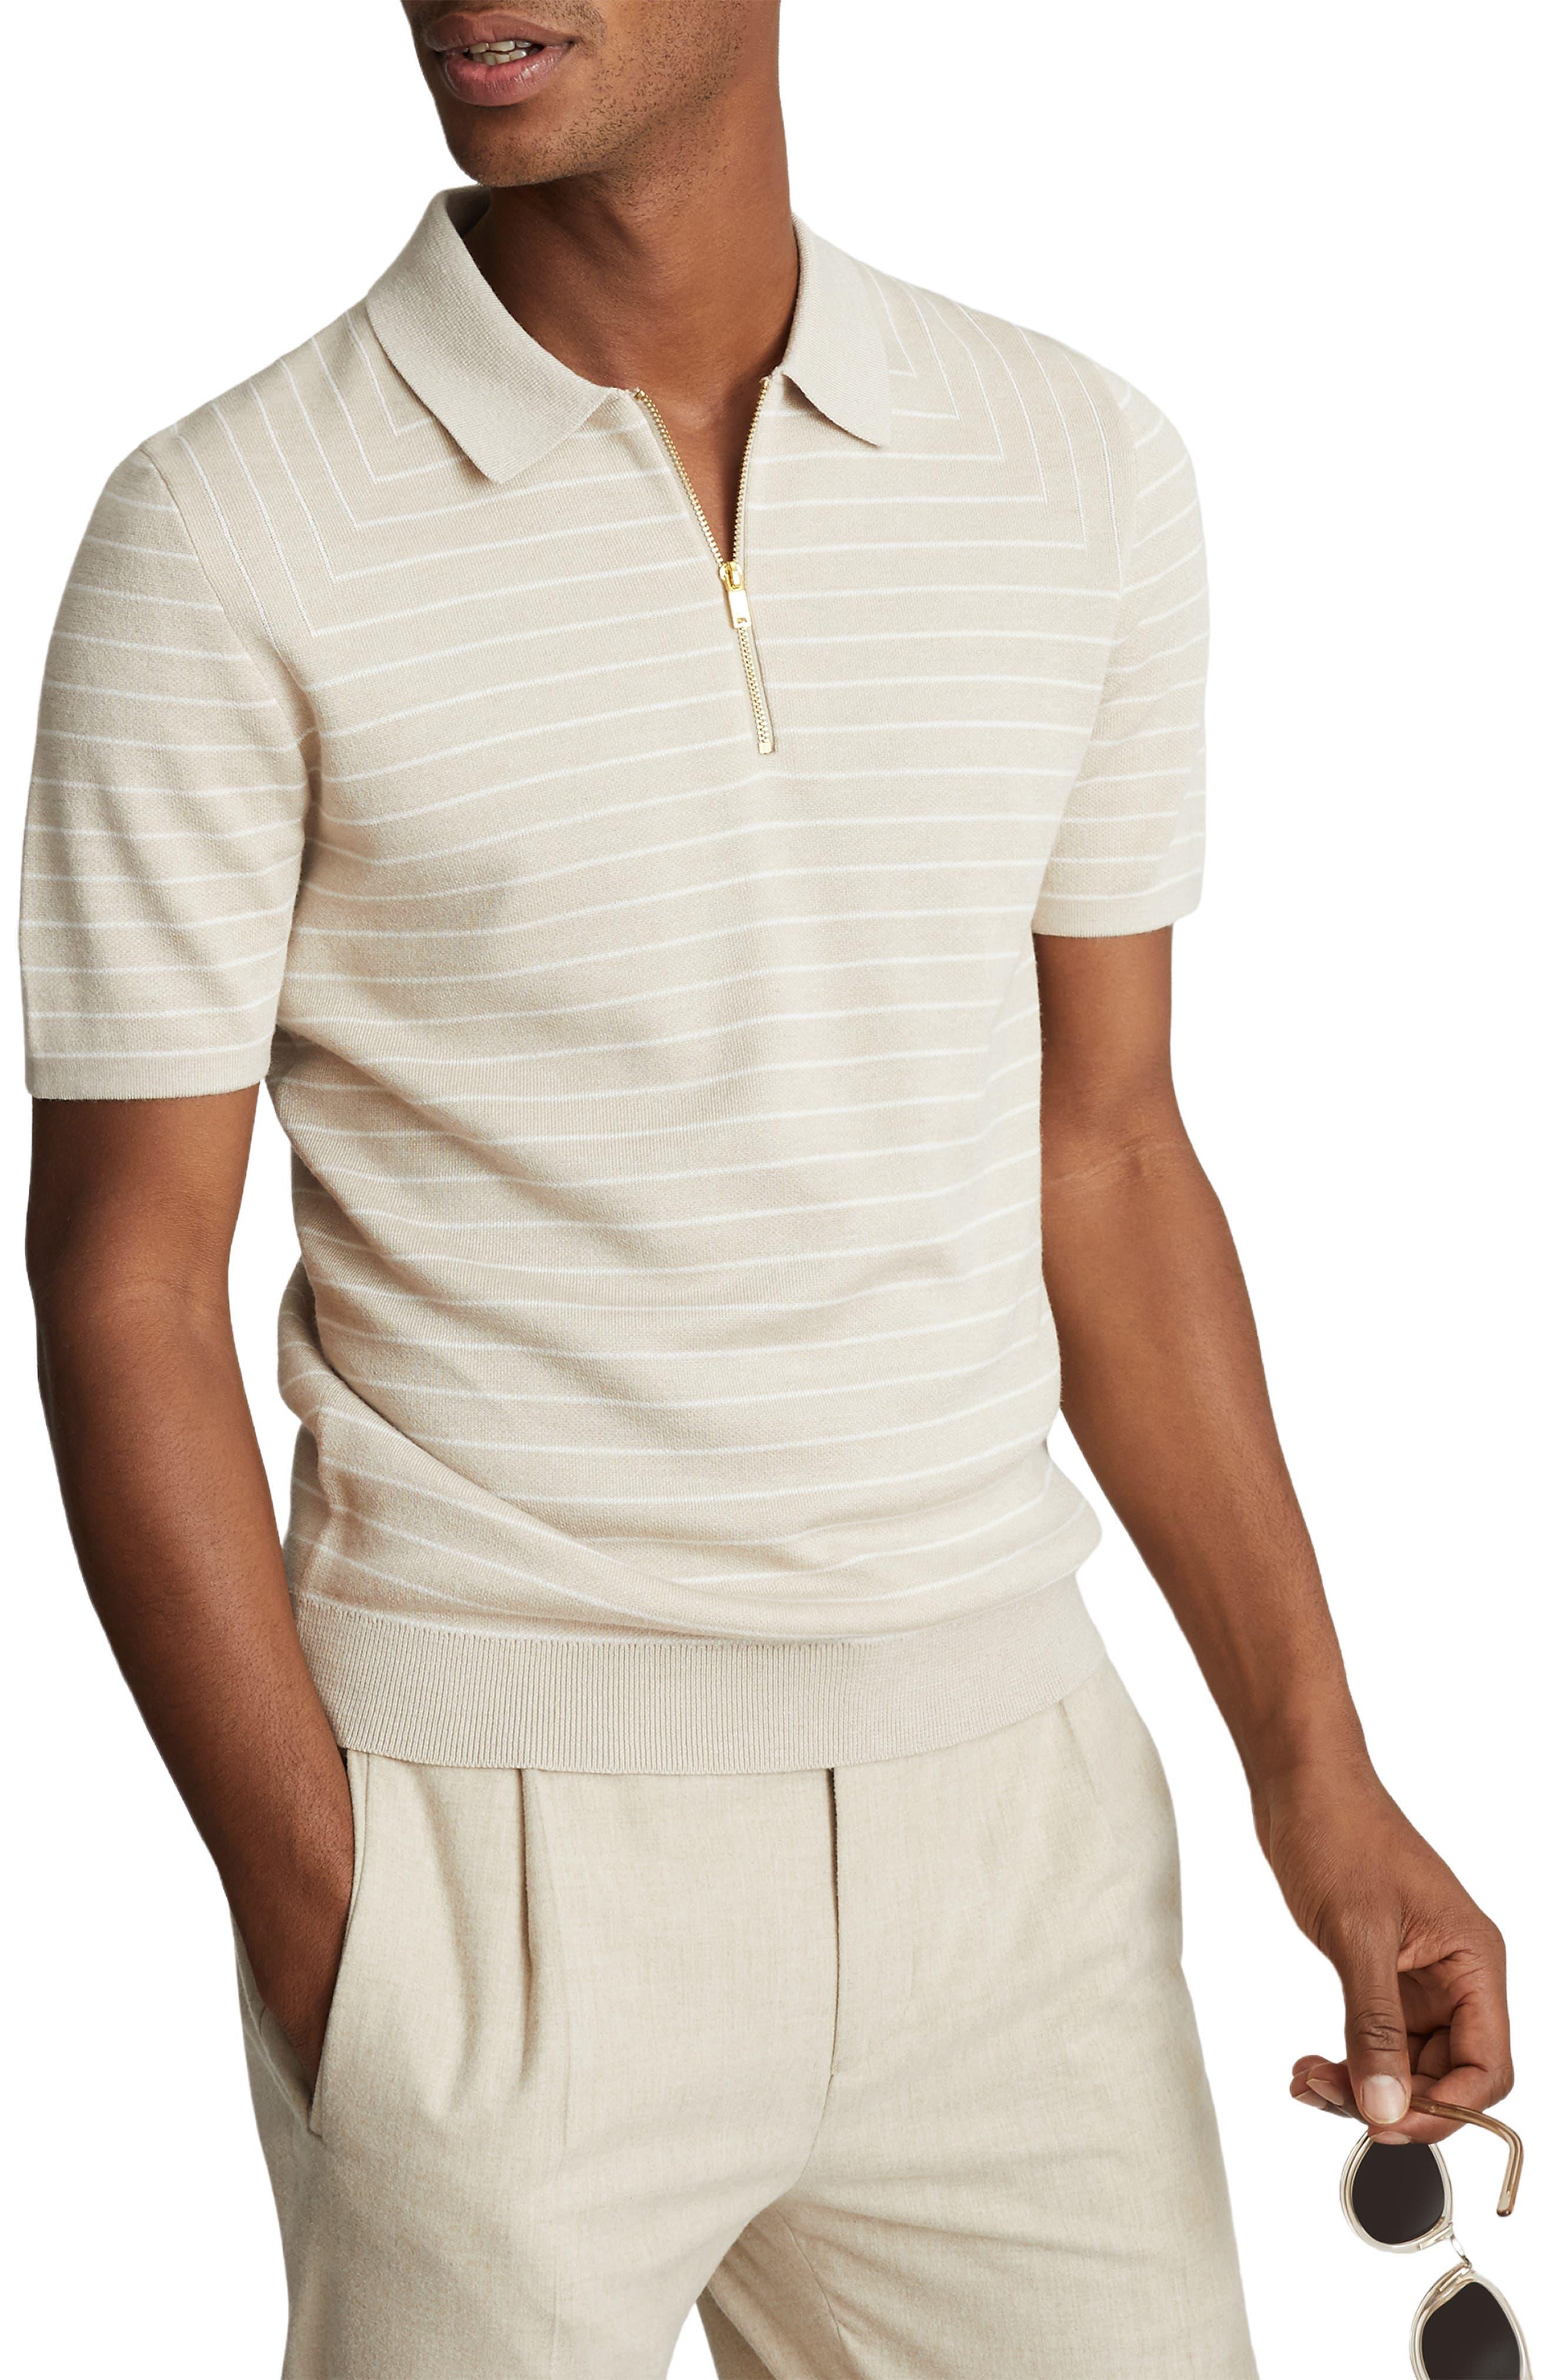 Mens Vintage Shirts – Casual, Dress, T-shirts, Polos Mens Reiss Verona Zip Neck Polo Size X-Large - Beige $80.00 AT vintagedancer.com